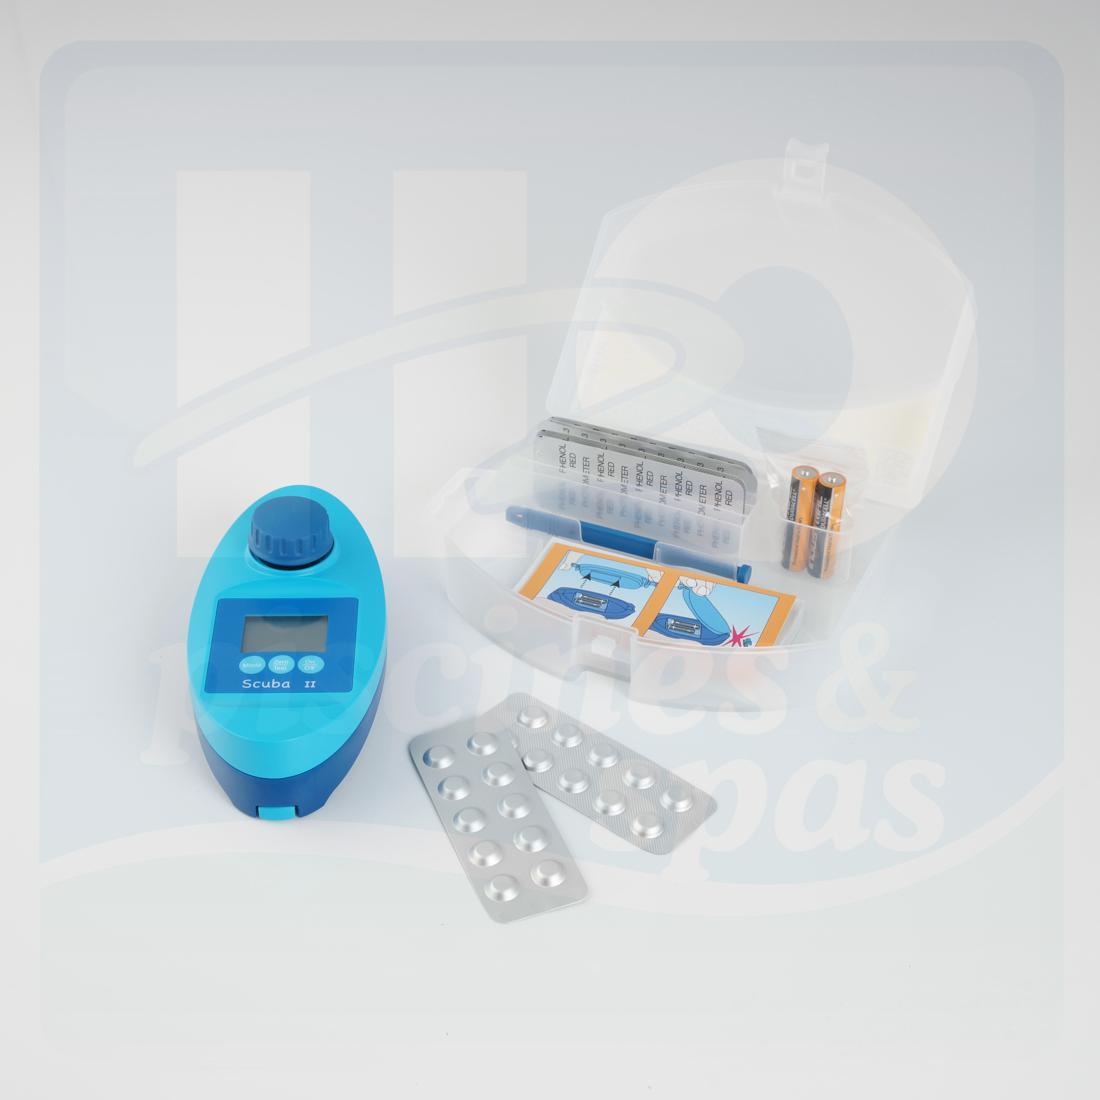 Photomètre Lovibond Scuba Ii - H2O Piscines & Spas pour Photomètre Piscine